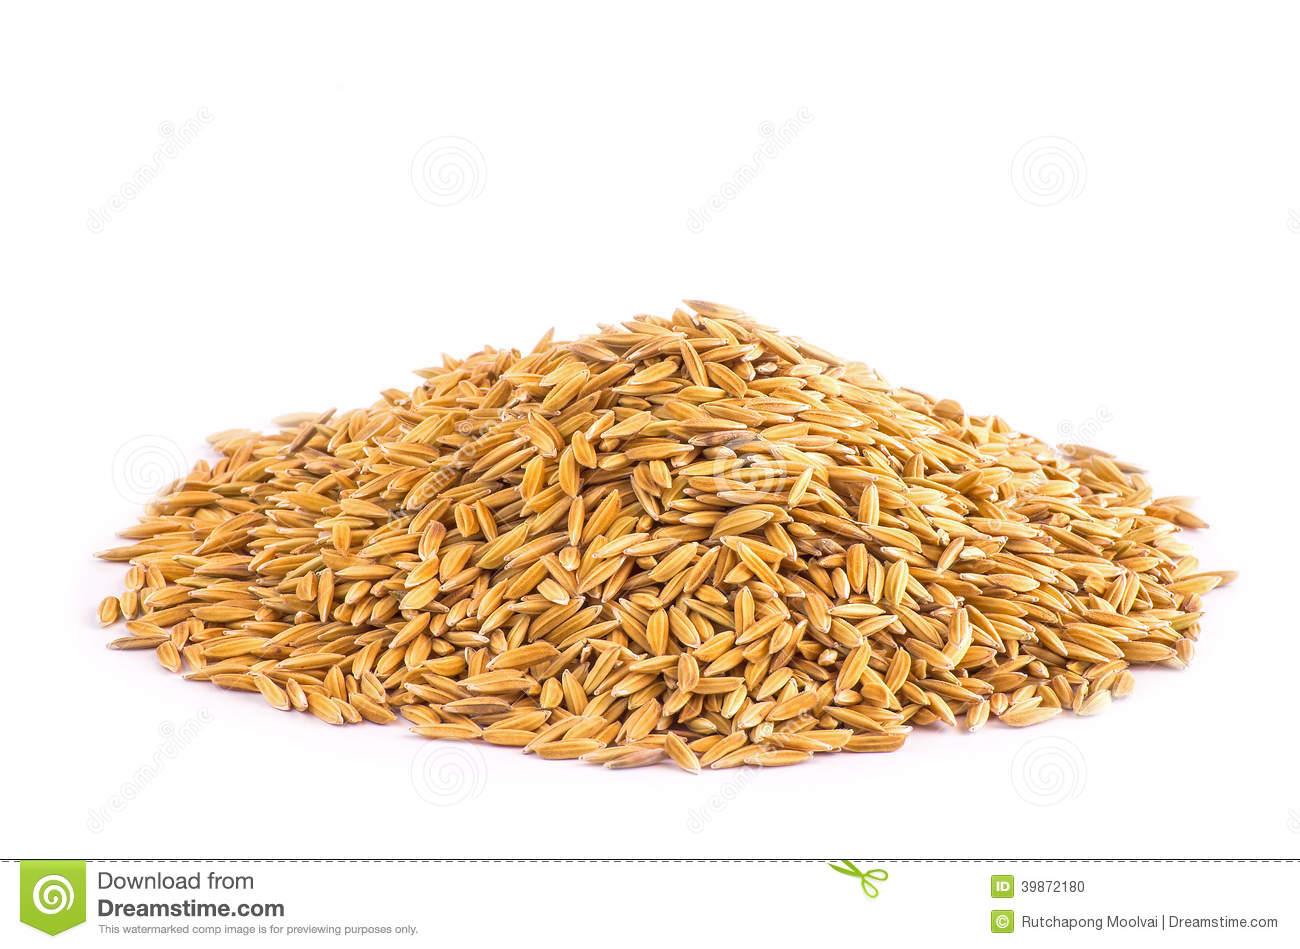 Rice grains clipart 7 » Clipart Station.